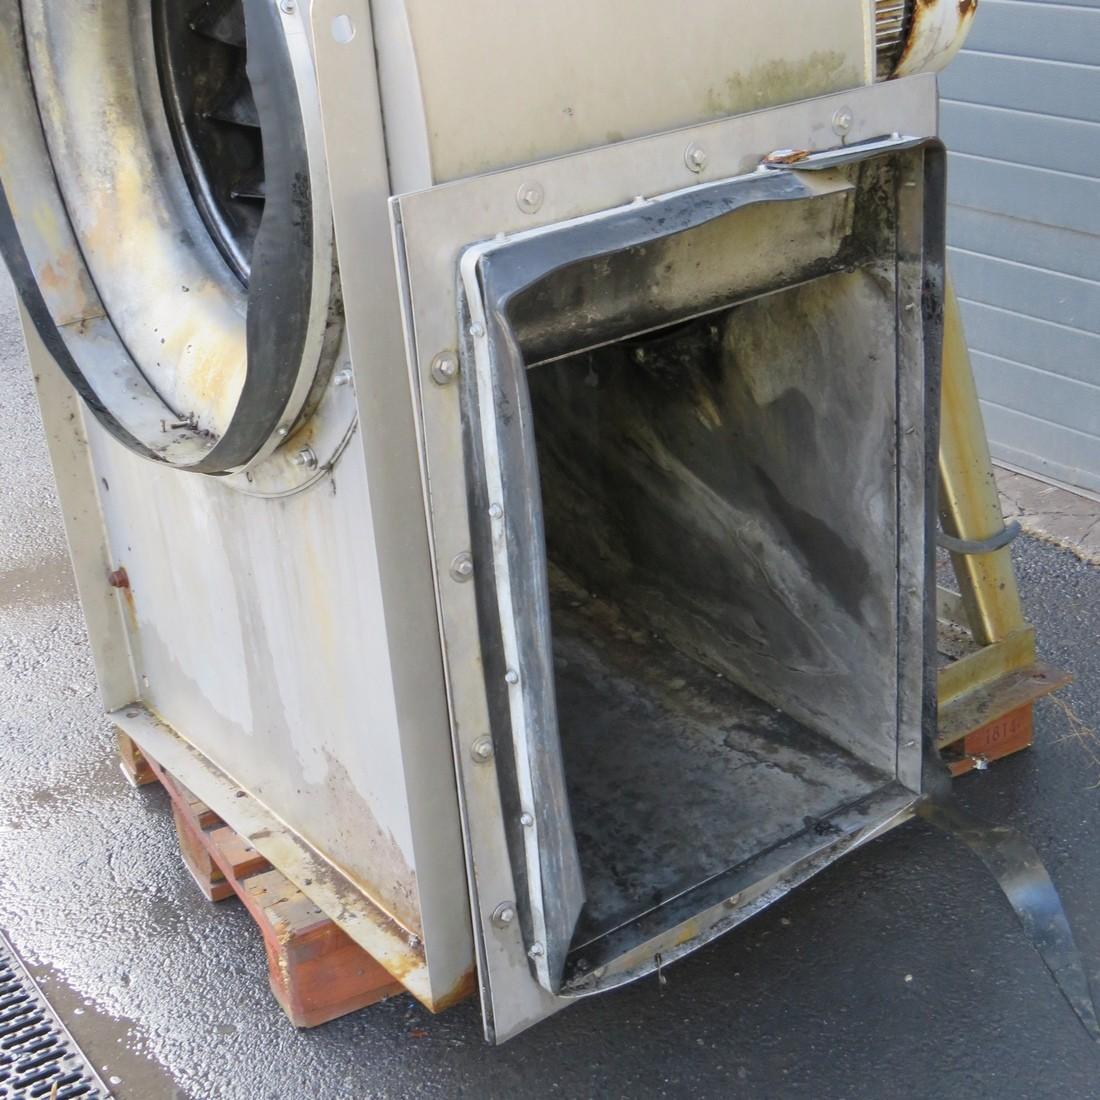 R1X1269 Stainless steel MZ ASPIRATORI centrifugal fan RL800/4 type